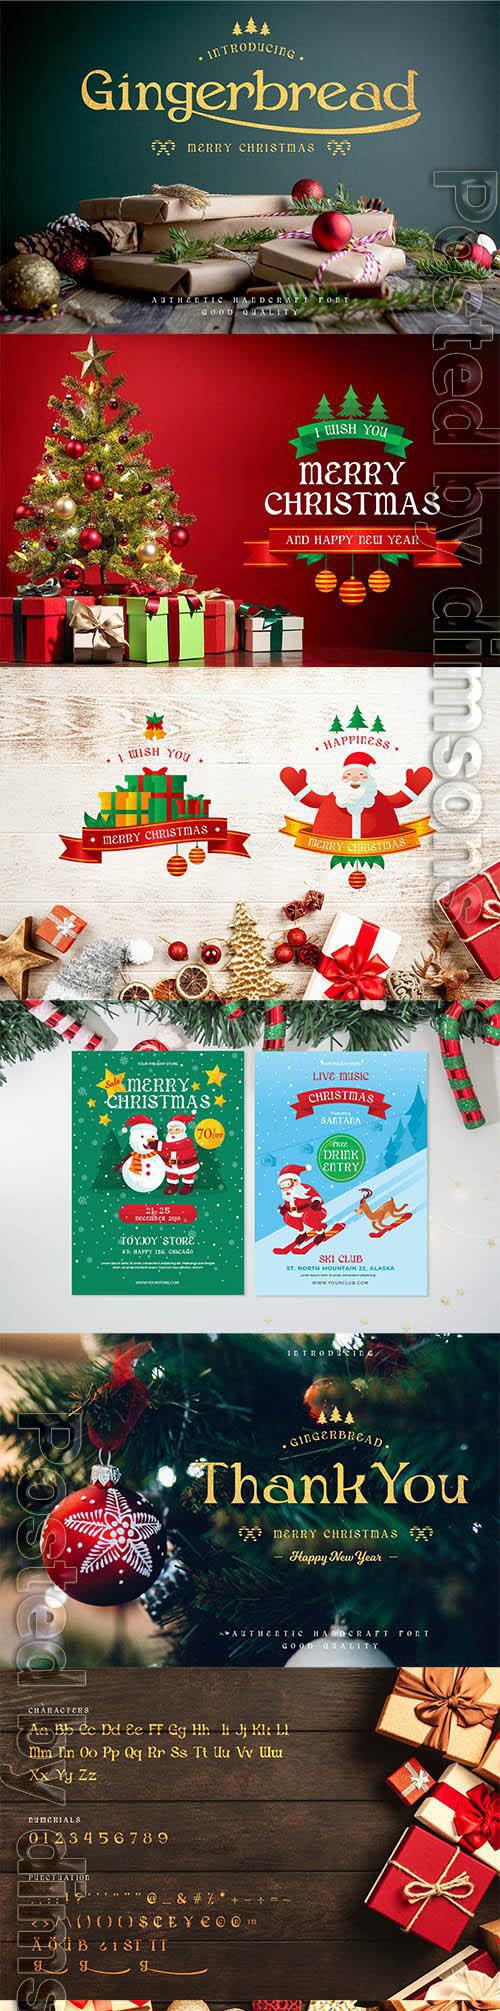 Gingerbread - Decorative Christmas Serif Font